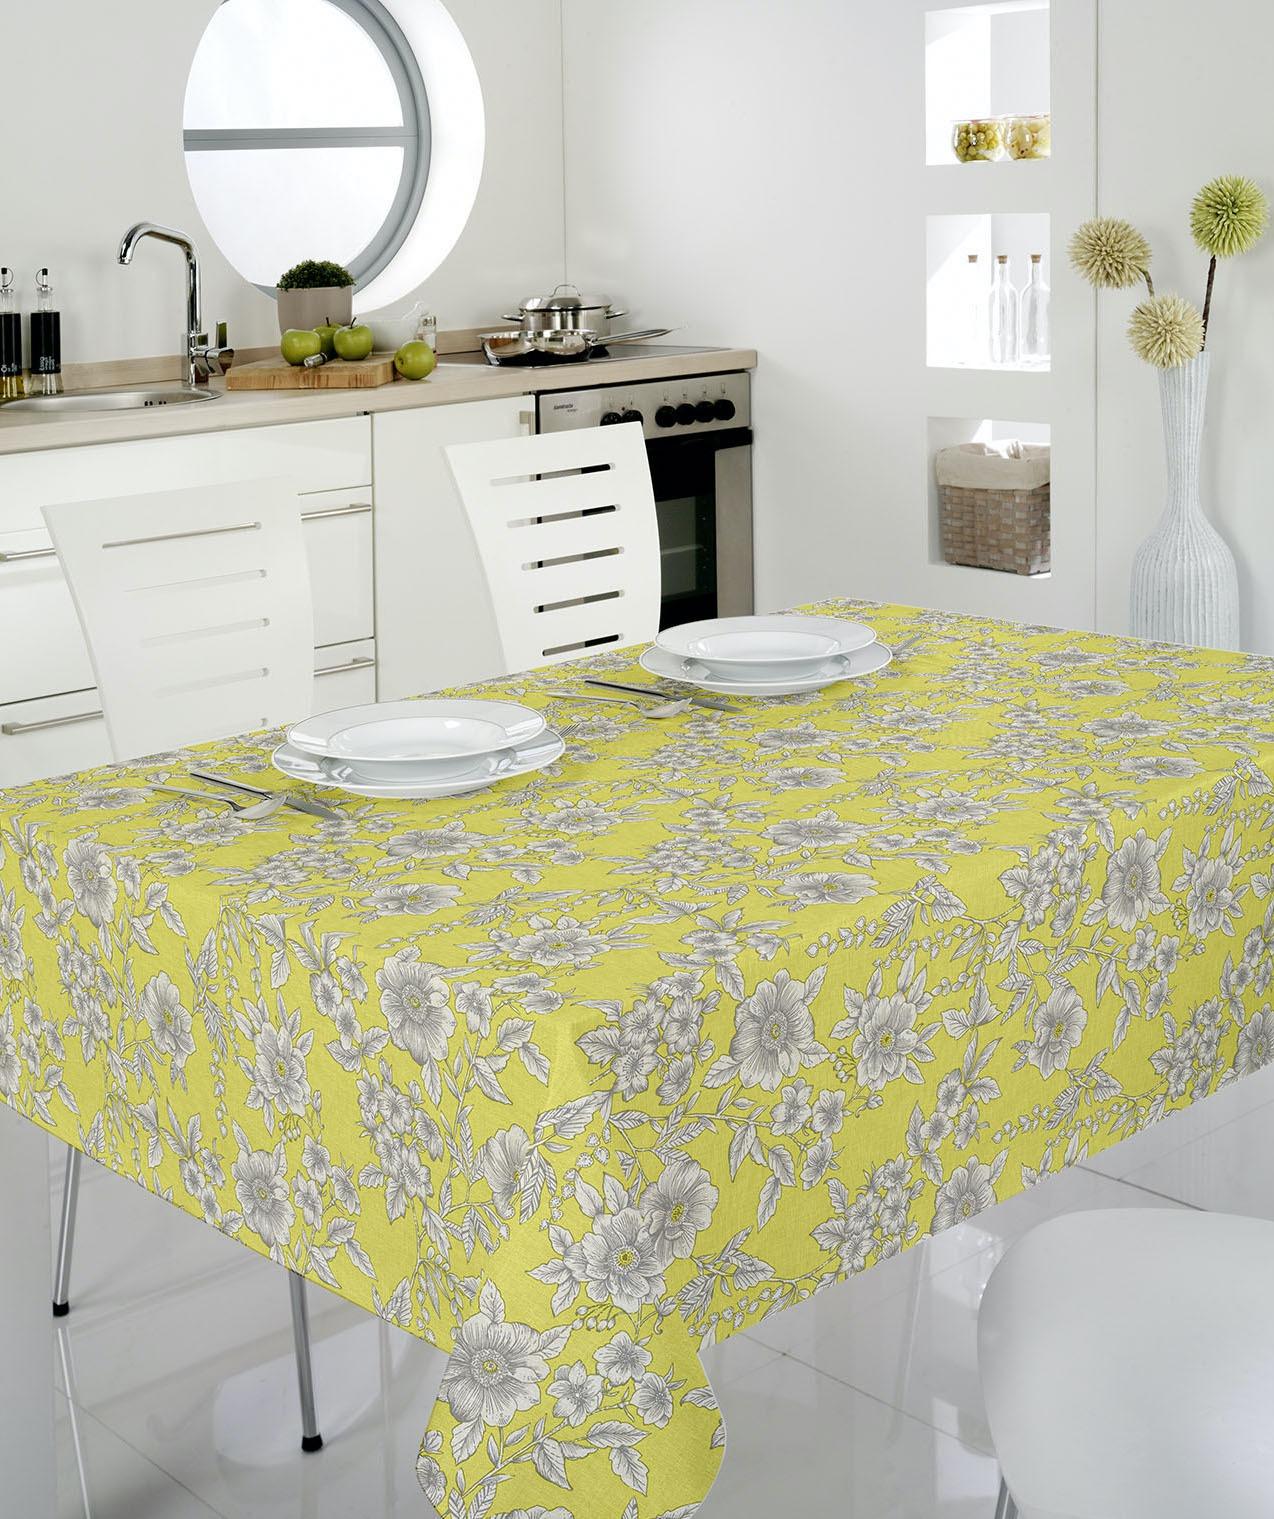 Bonita Table Cover with 2021 Pantone colors